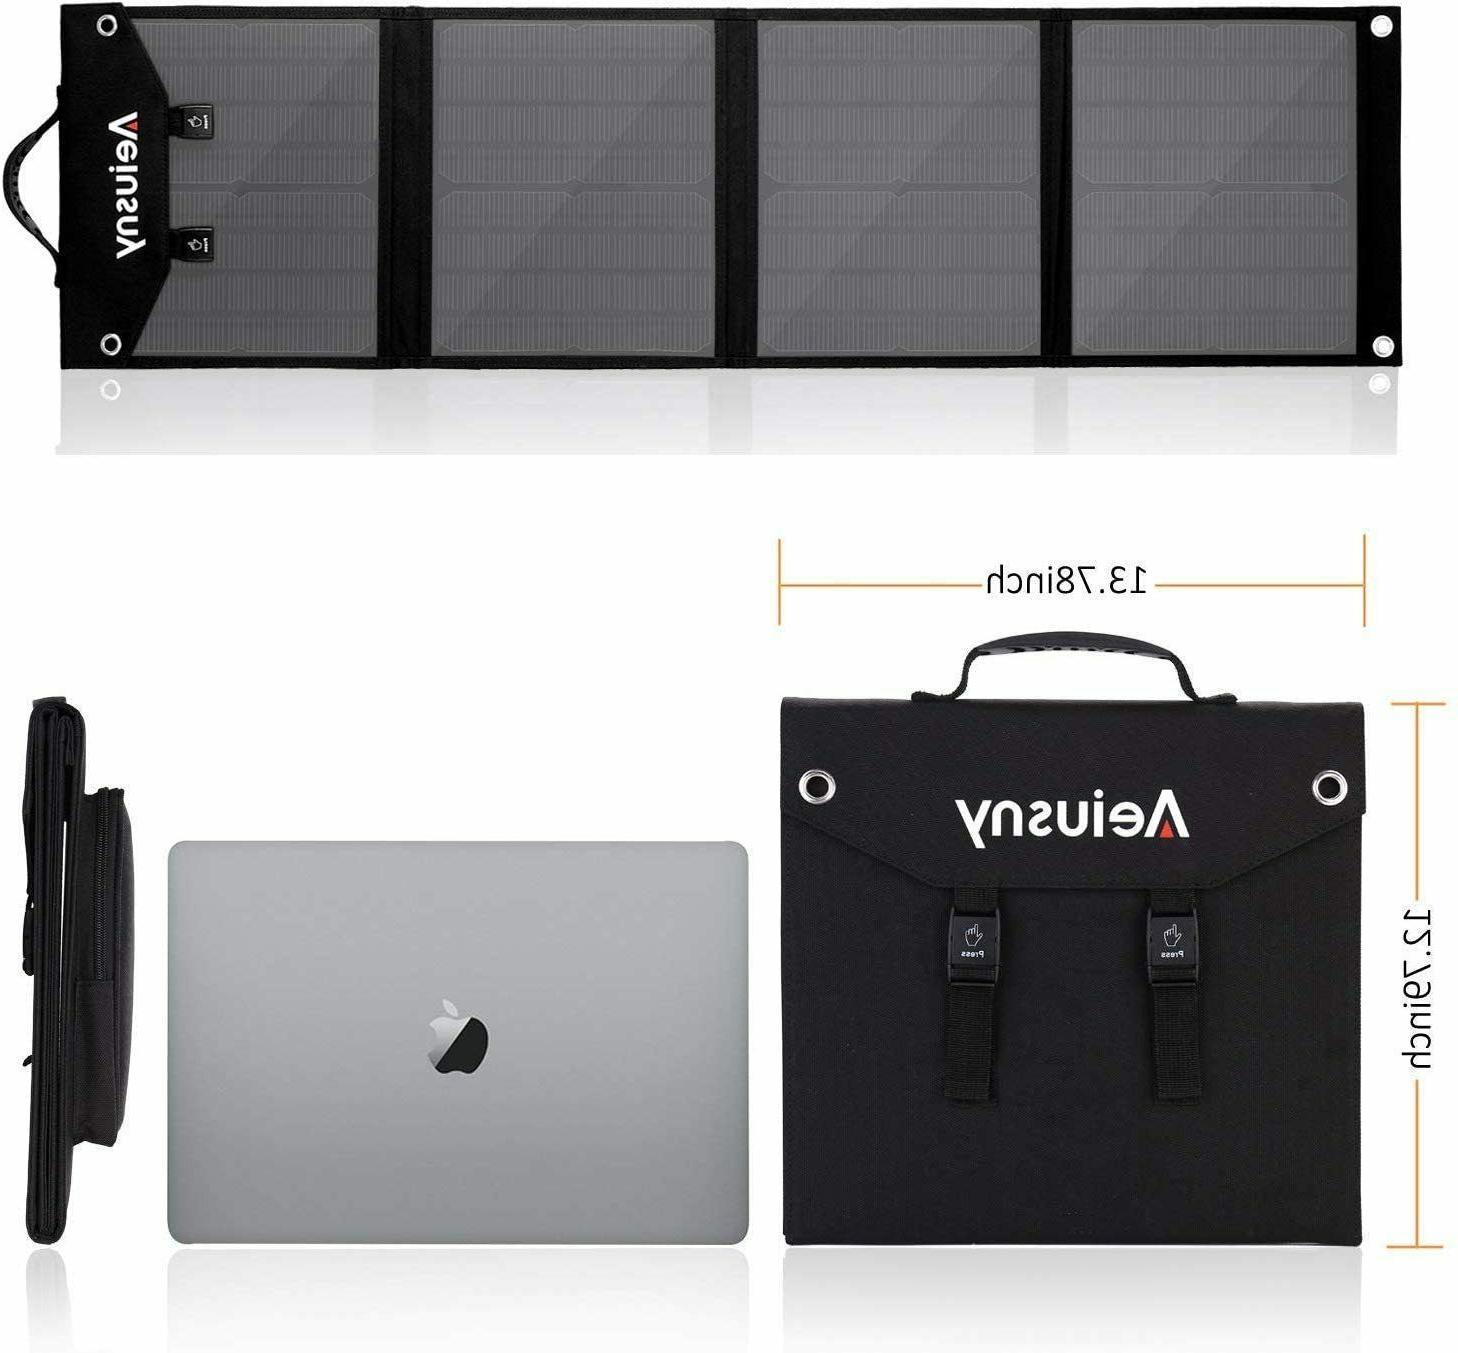 4 Panel 60W Portable Suaoki/Jackery/Webetop Portable